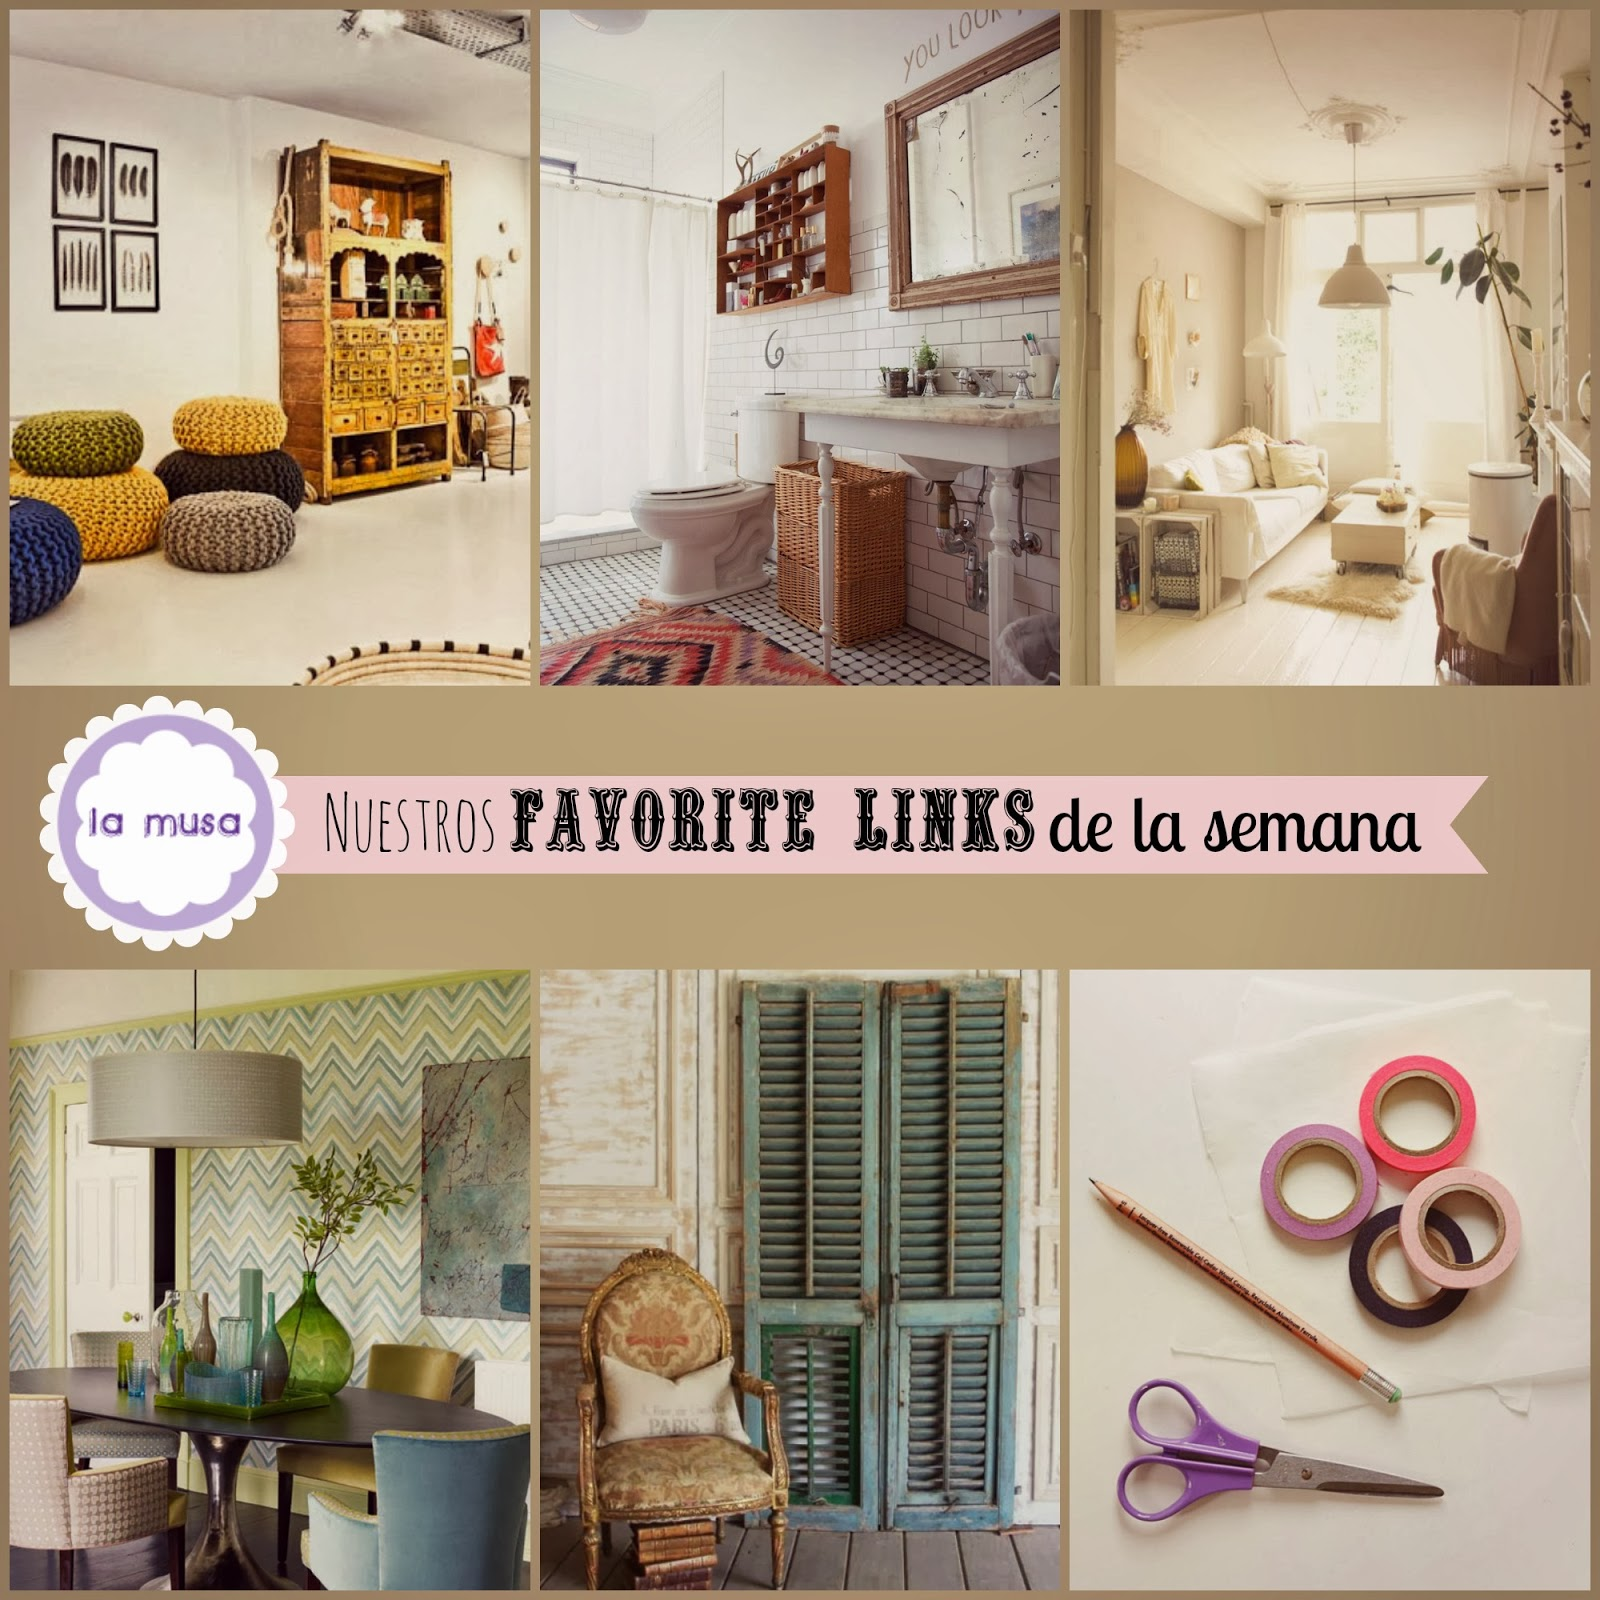 Favorite Links, La Musa Decoracion, Decoracion, Decor, Inspire, DIY, home